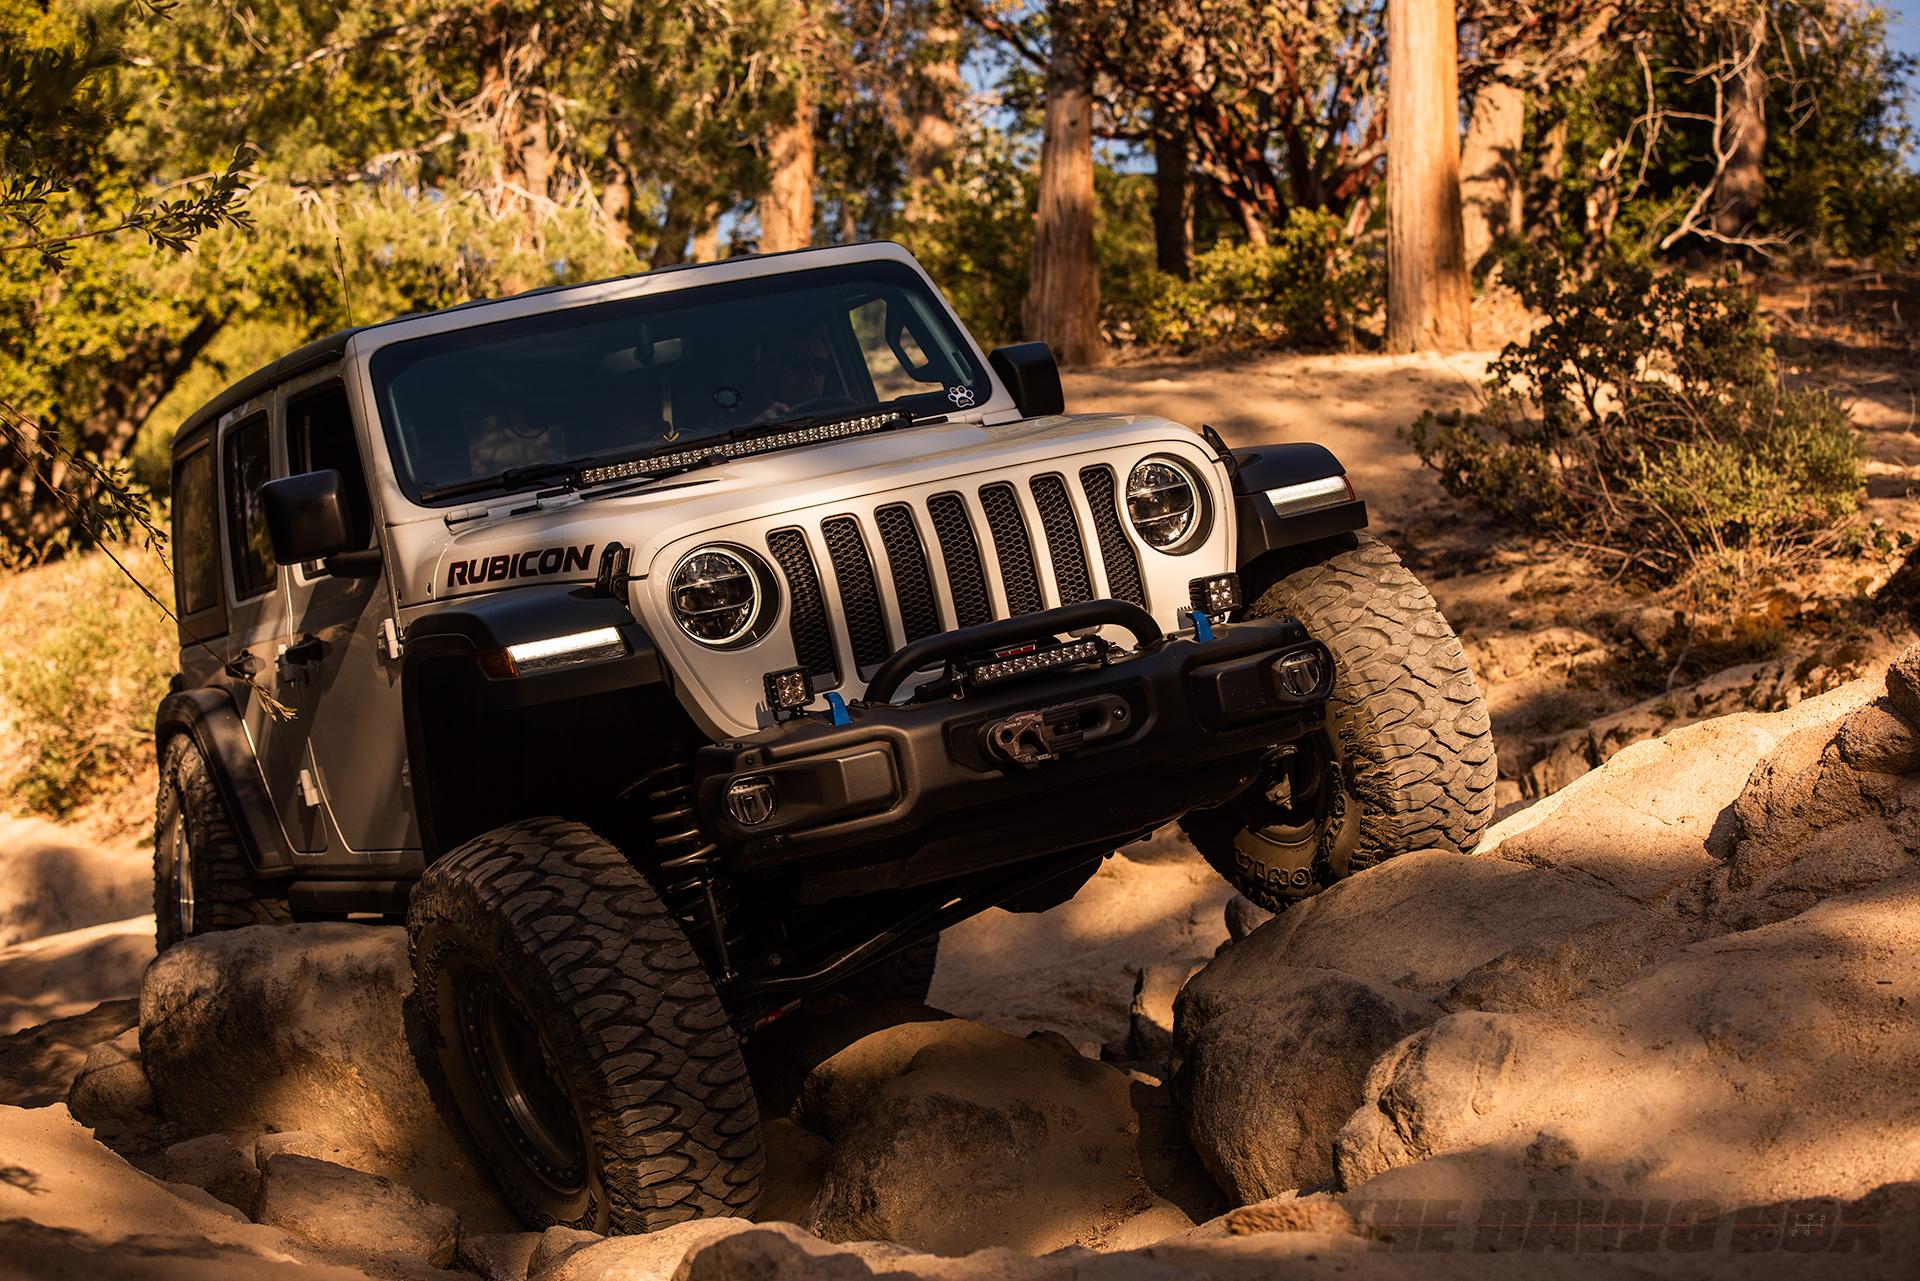 White Jeep Wrangler Rubicon rock crawling